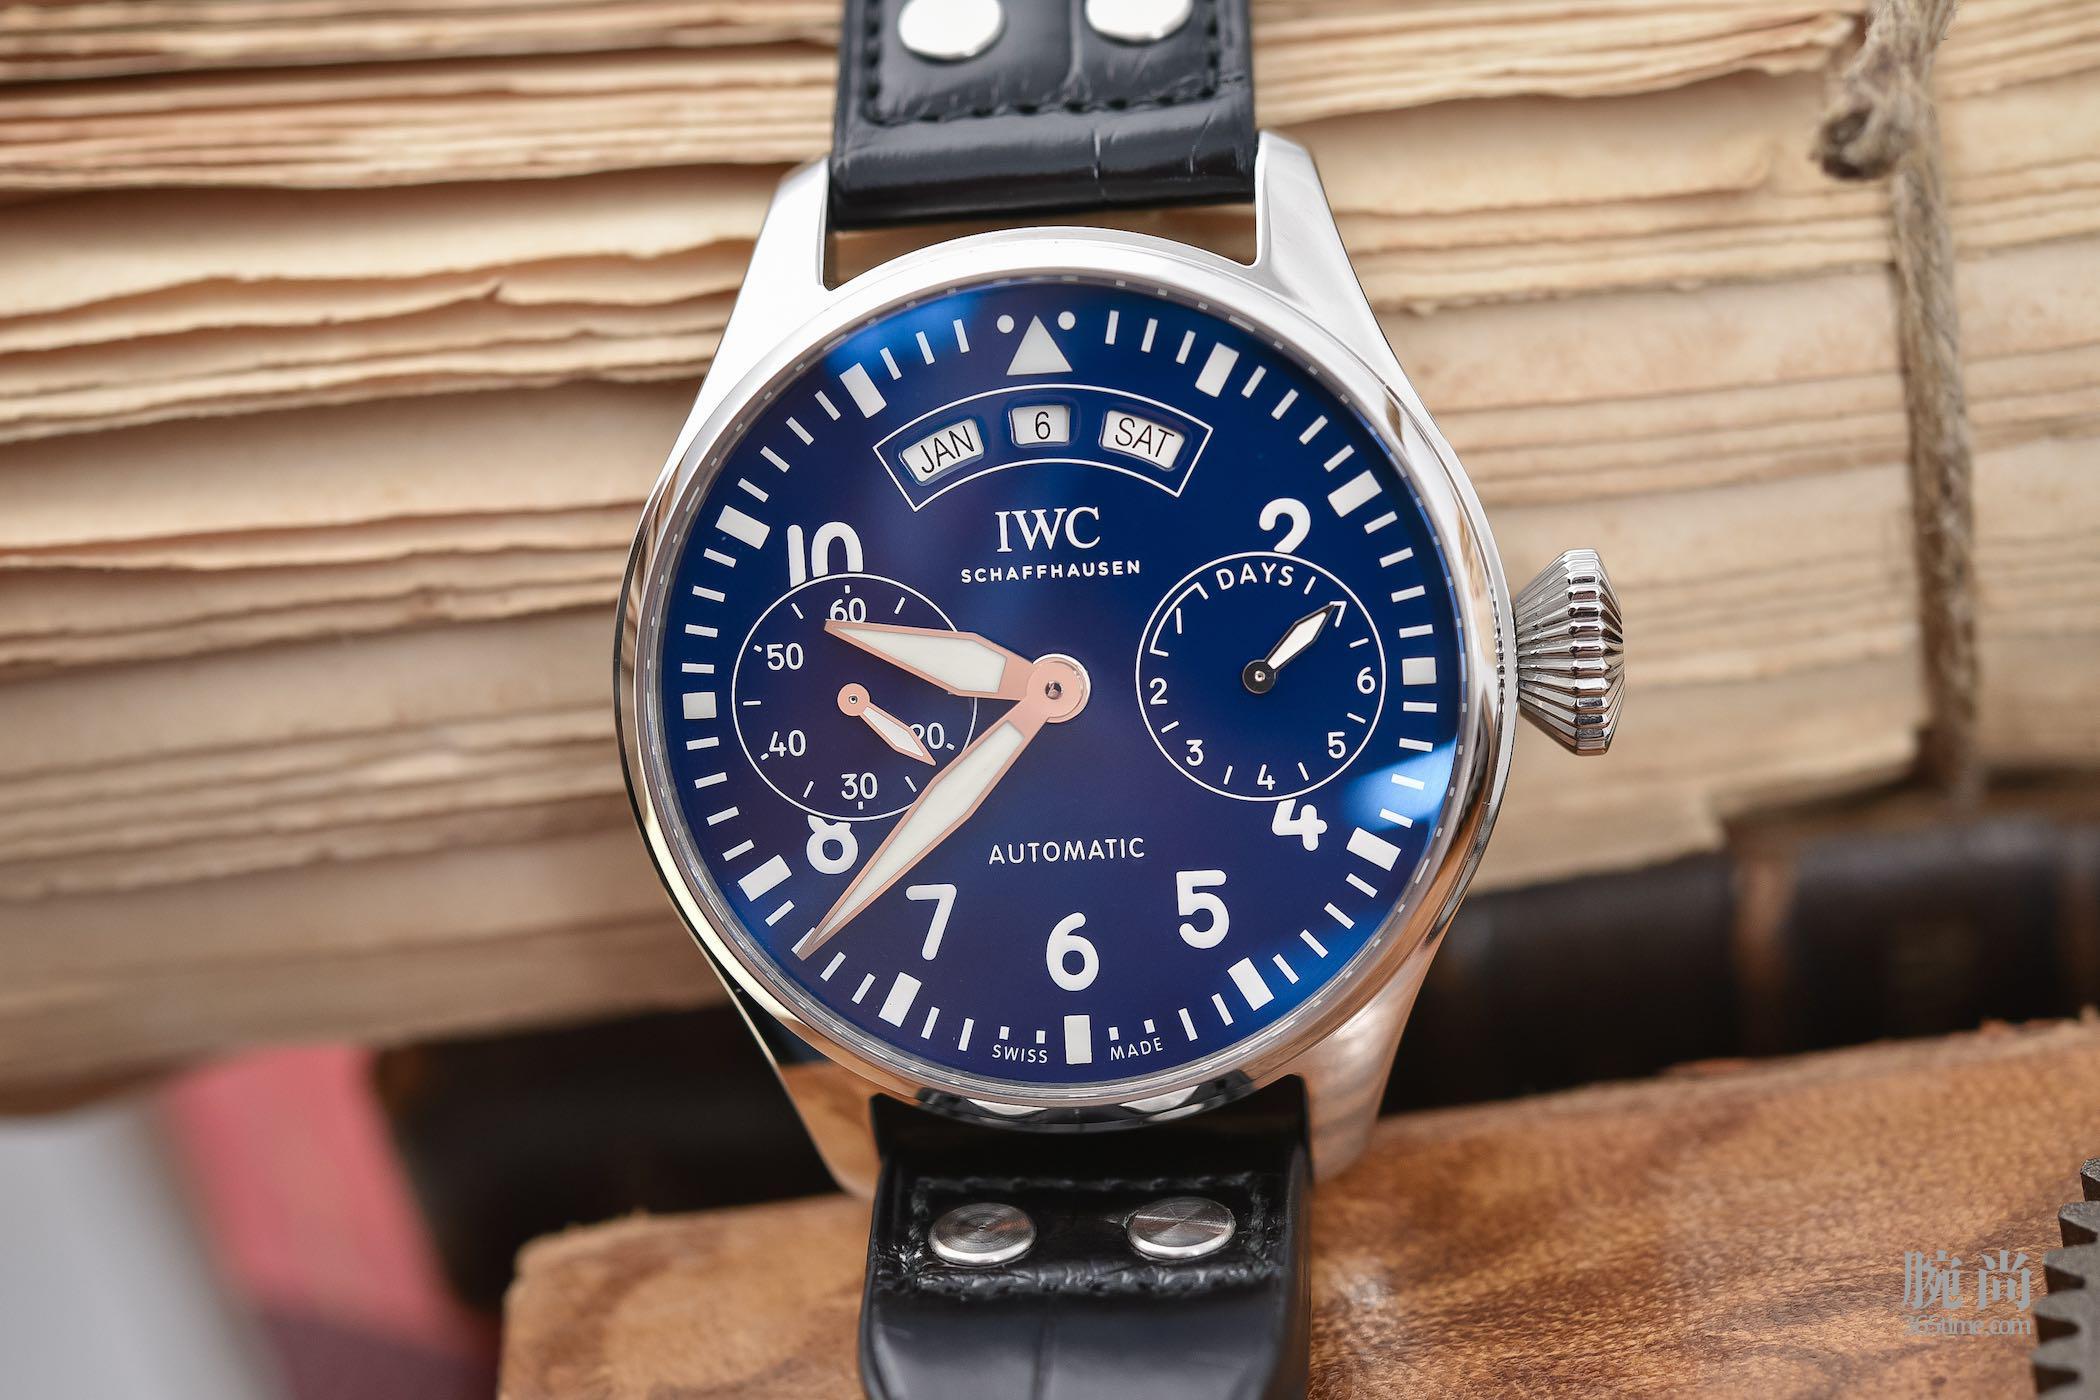 IWC-Big-Pilot's-Watch-Annual-Calendar-Edition-150-Years-SIHH-2018-2.jpg